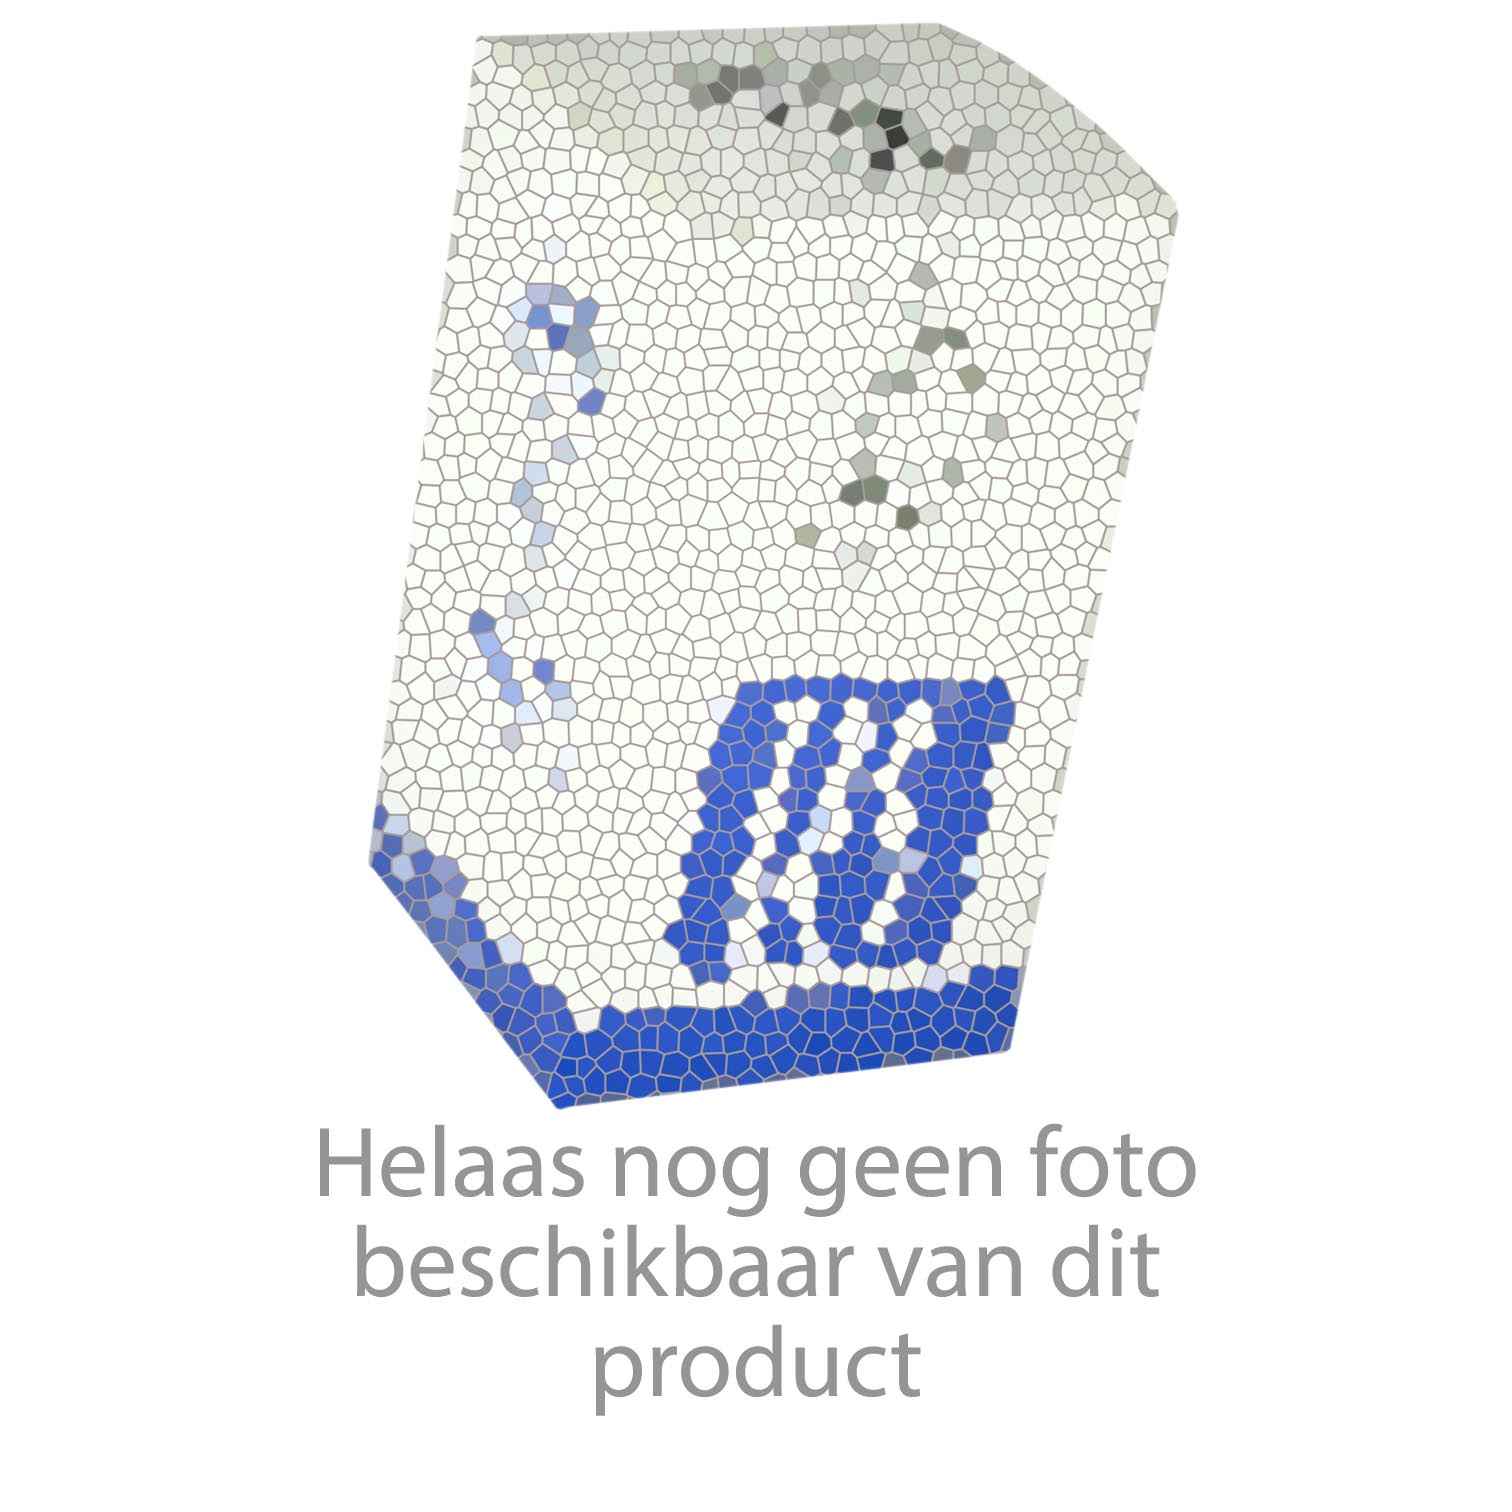 Grohe onderdelen Allure Brilliant 3-Gats Wastafelmengkraan Laag M/Waste 20342000